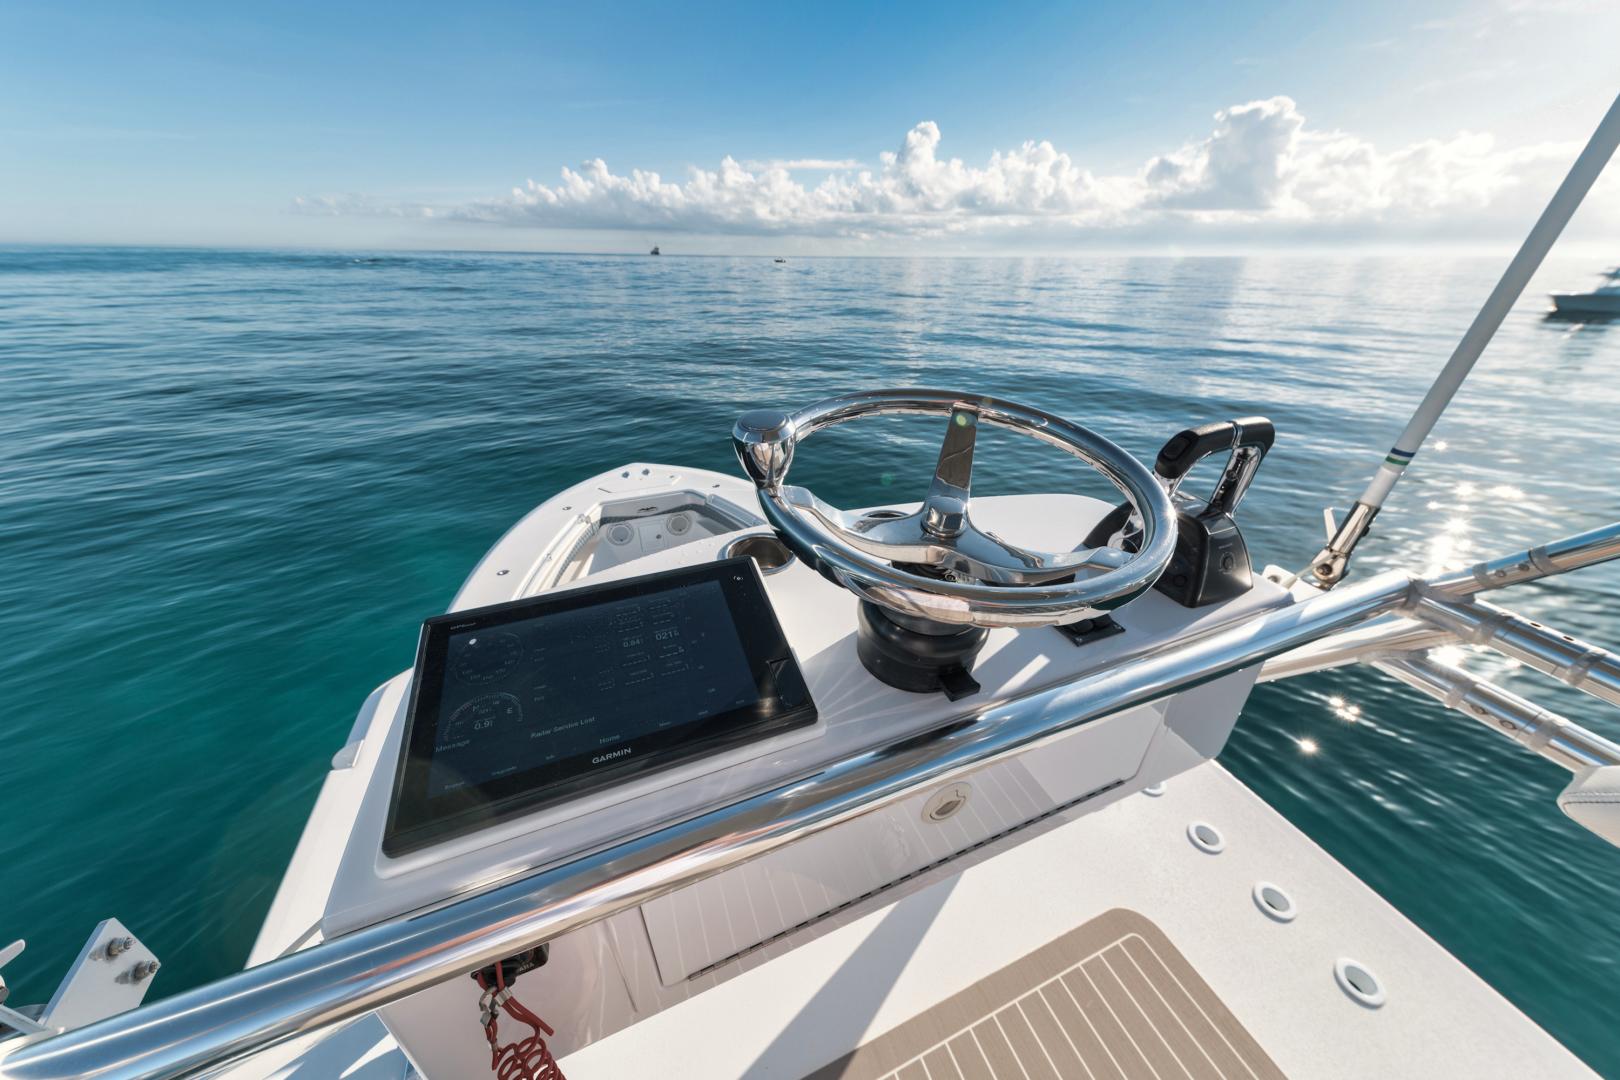 Invincible-Open Fisherman 2017-42 Invincible Jupiter-Florida-United States-1604197   Thumbnail